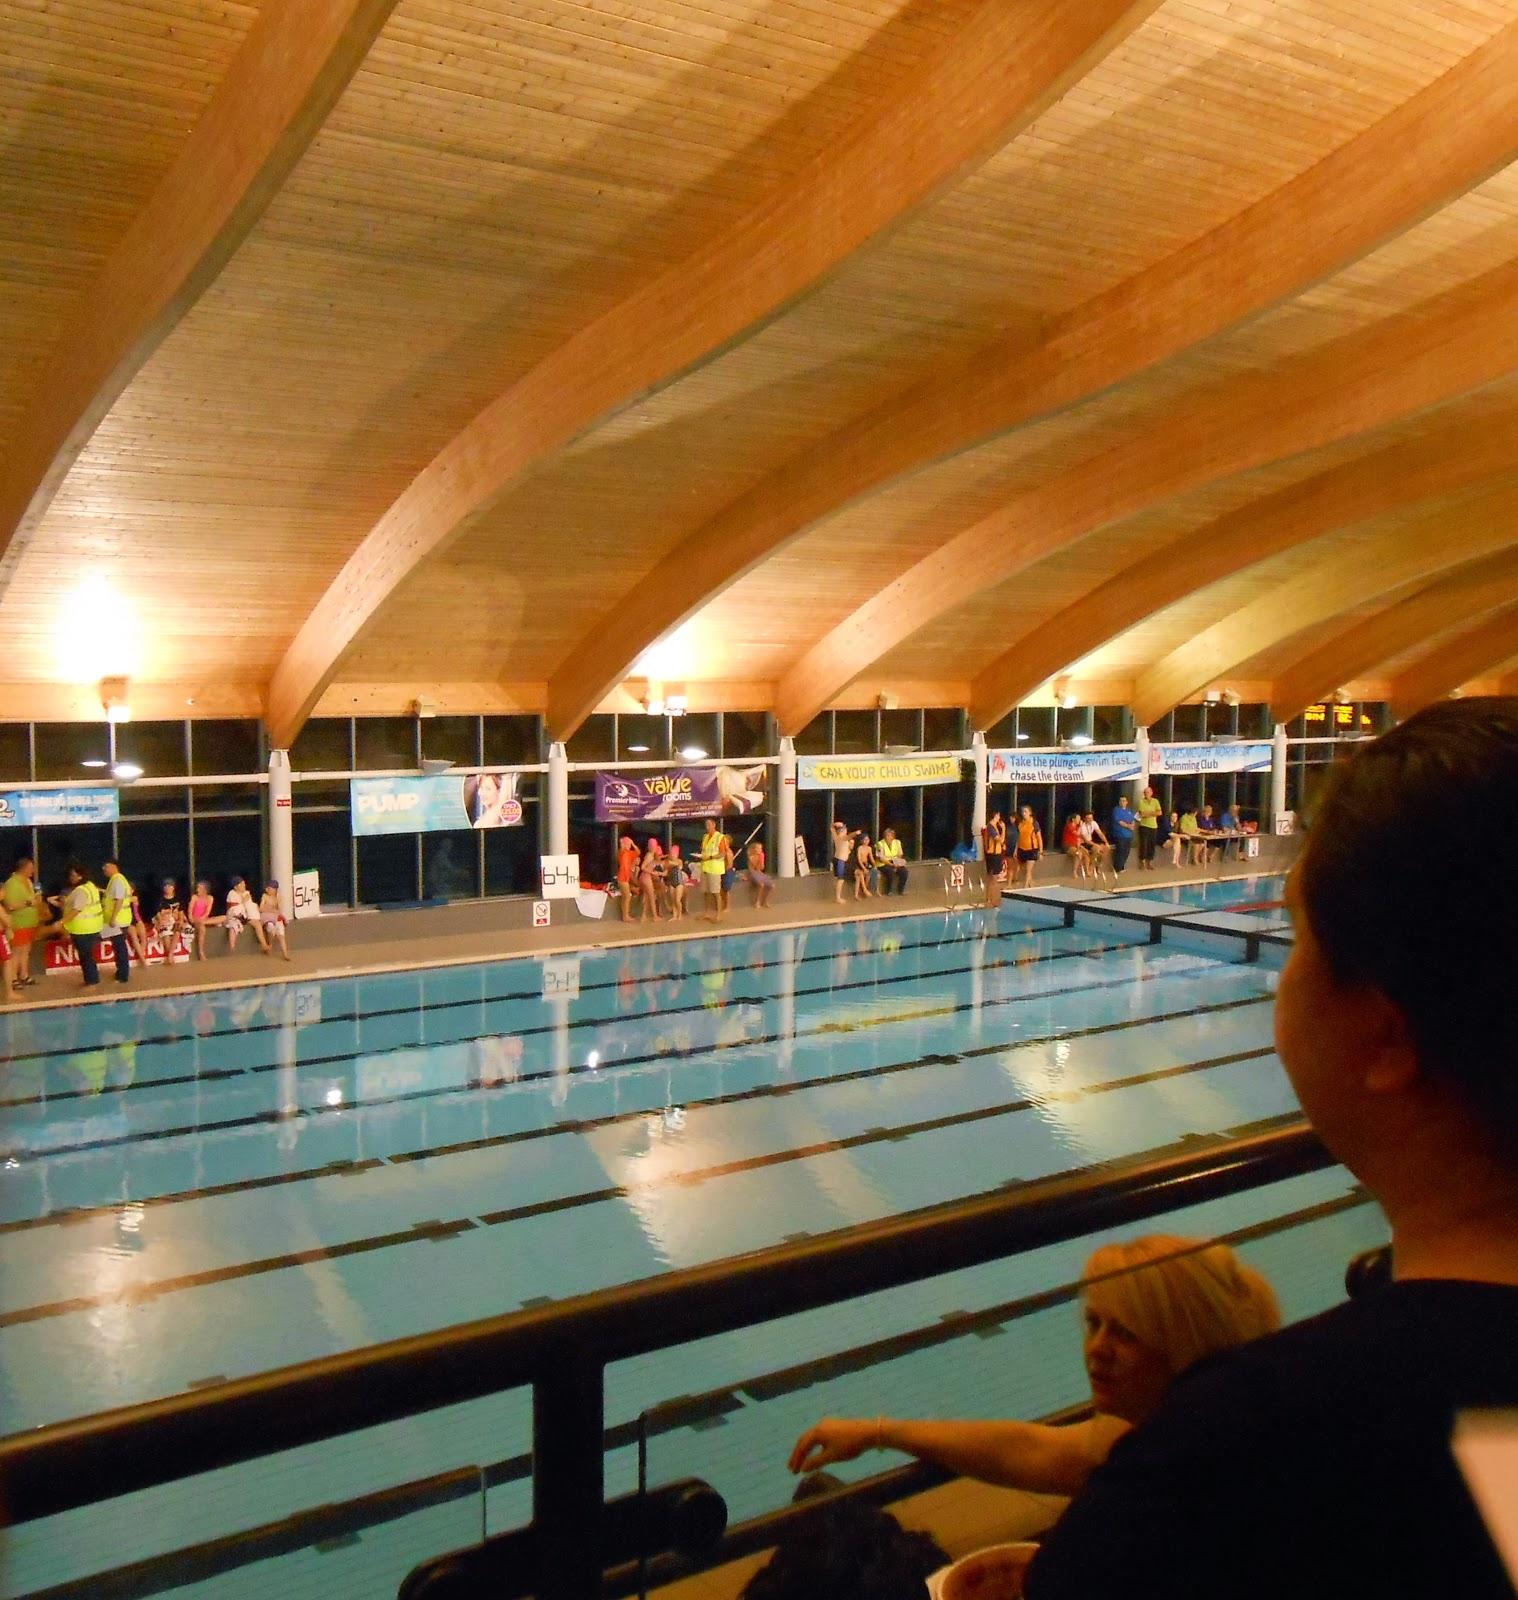 mountbatten centre portsmouth swimming pool